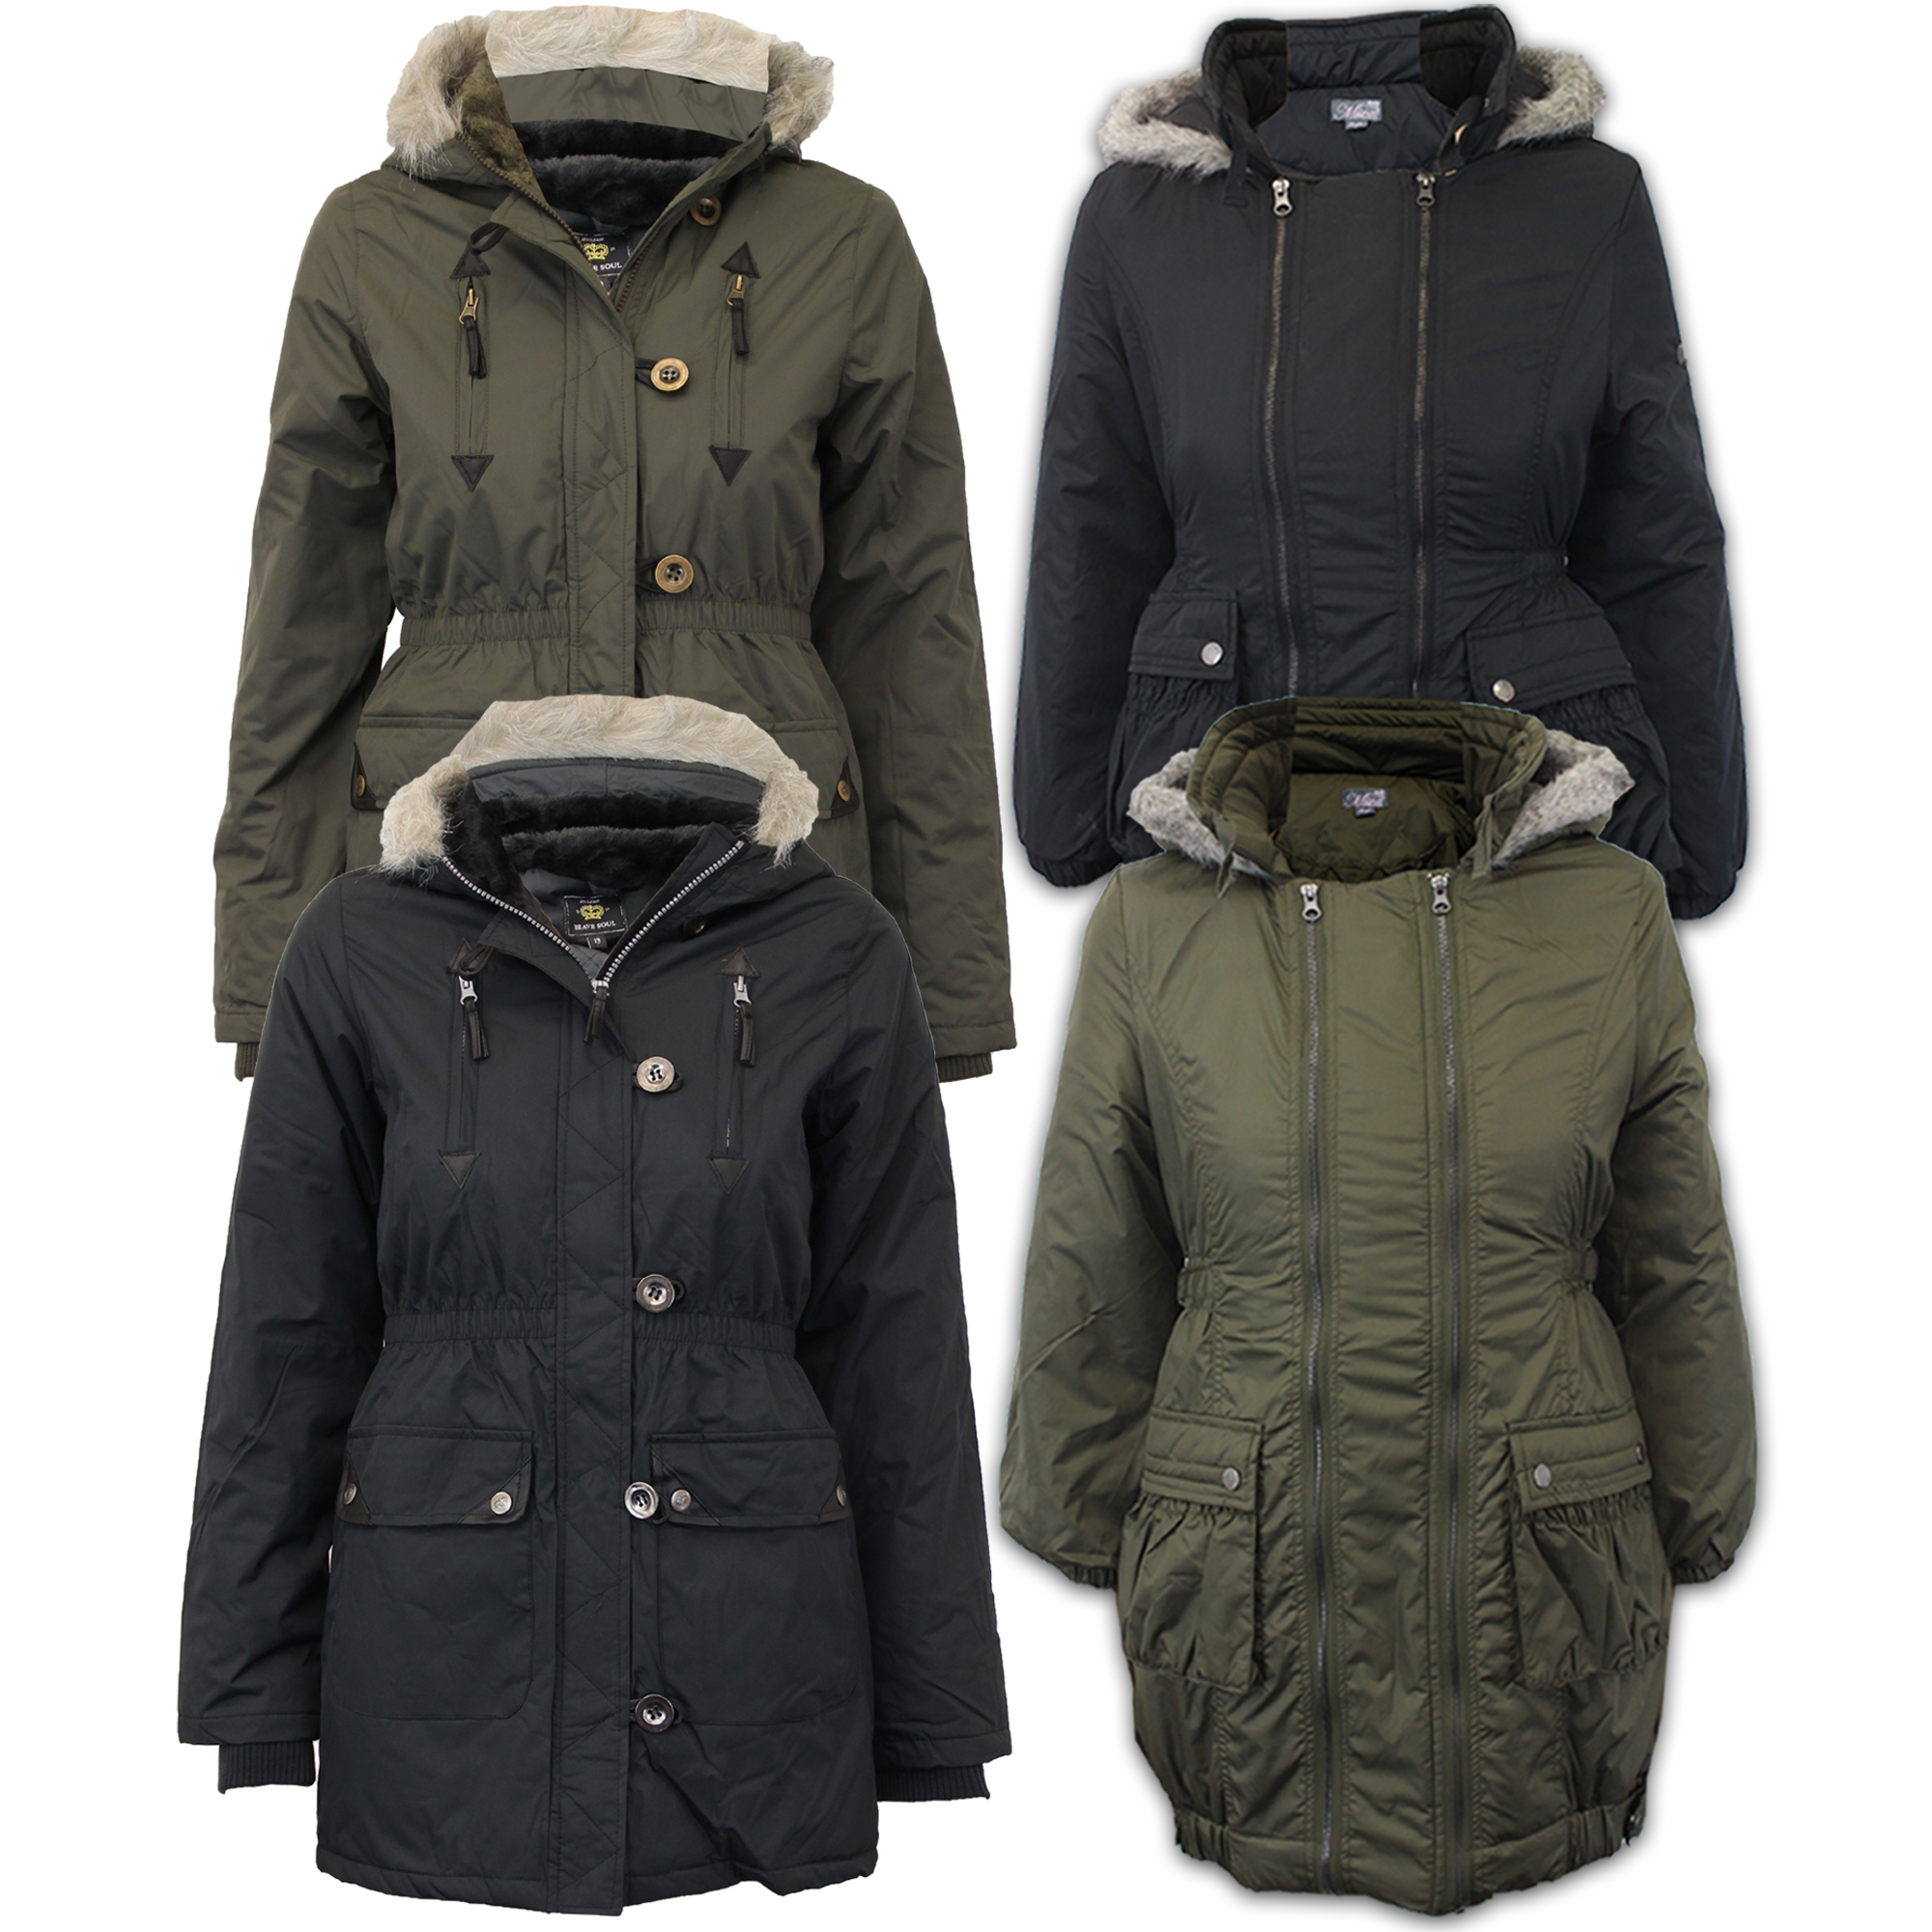 bc153ac96 Girls Jacket Brave Soul Kids Parka School Coat Hooded Military Fur ...